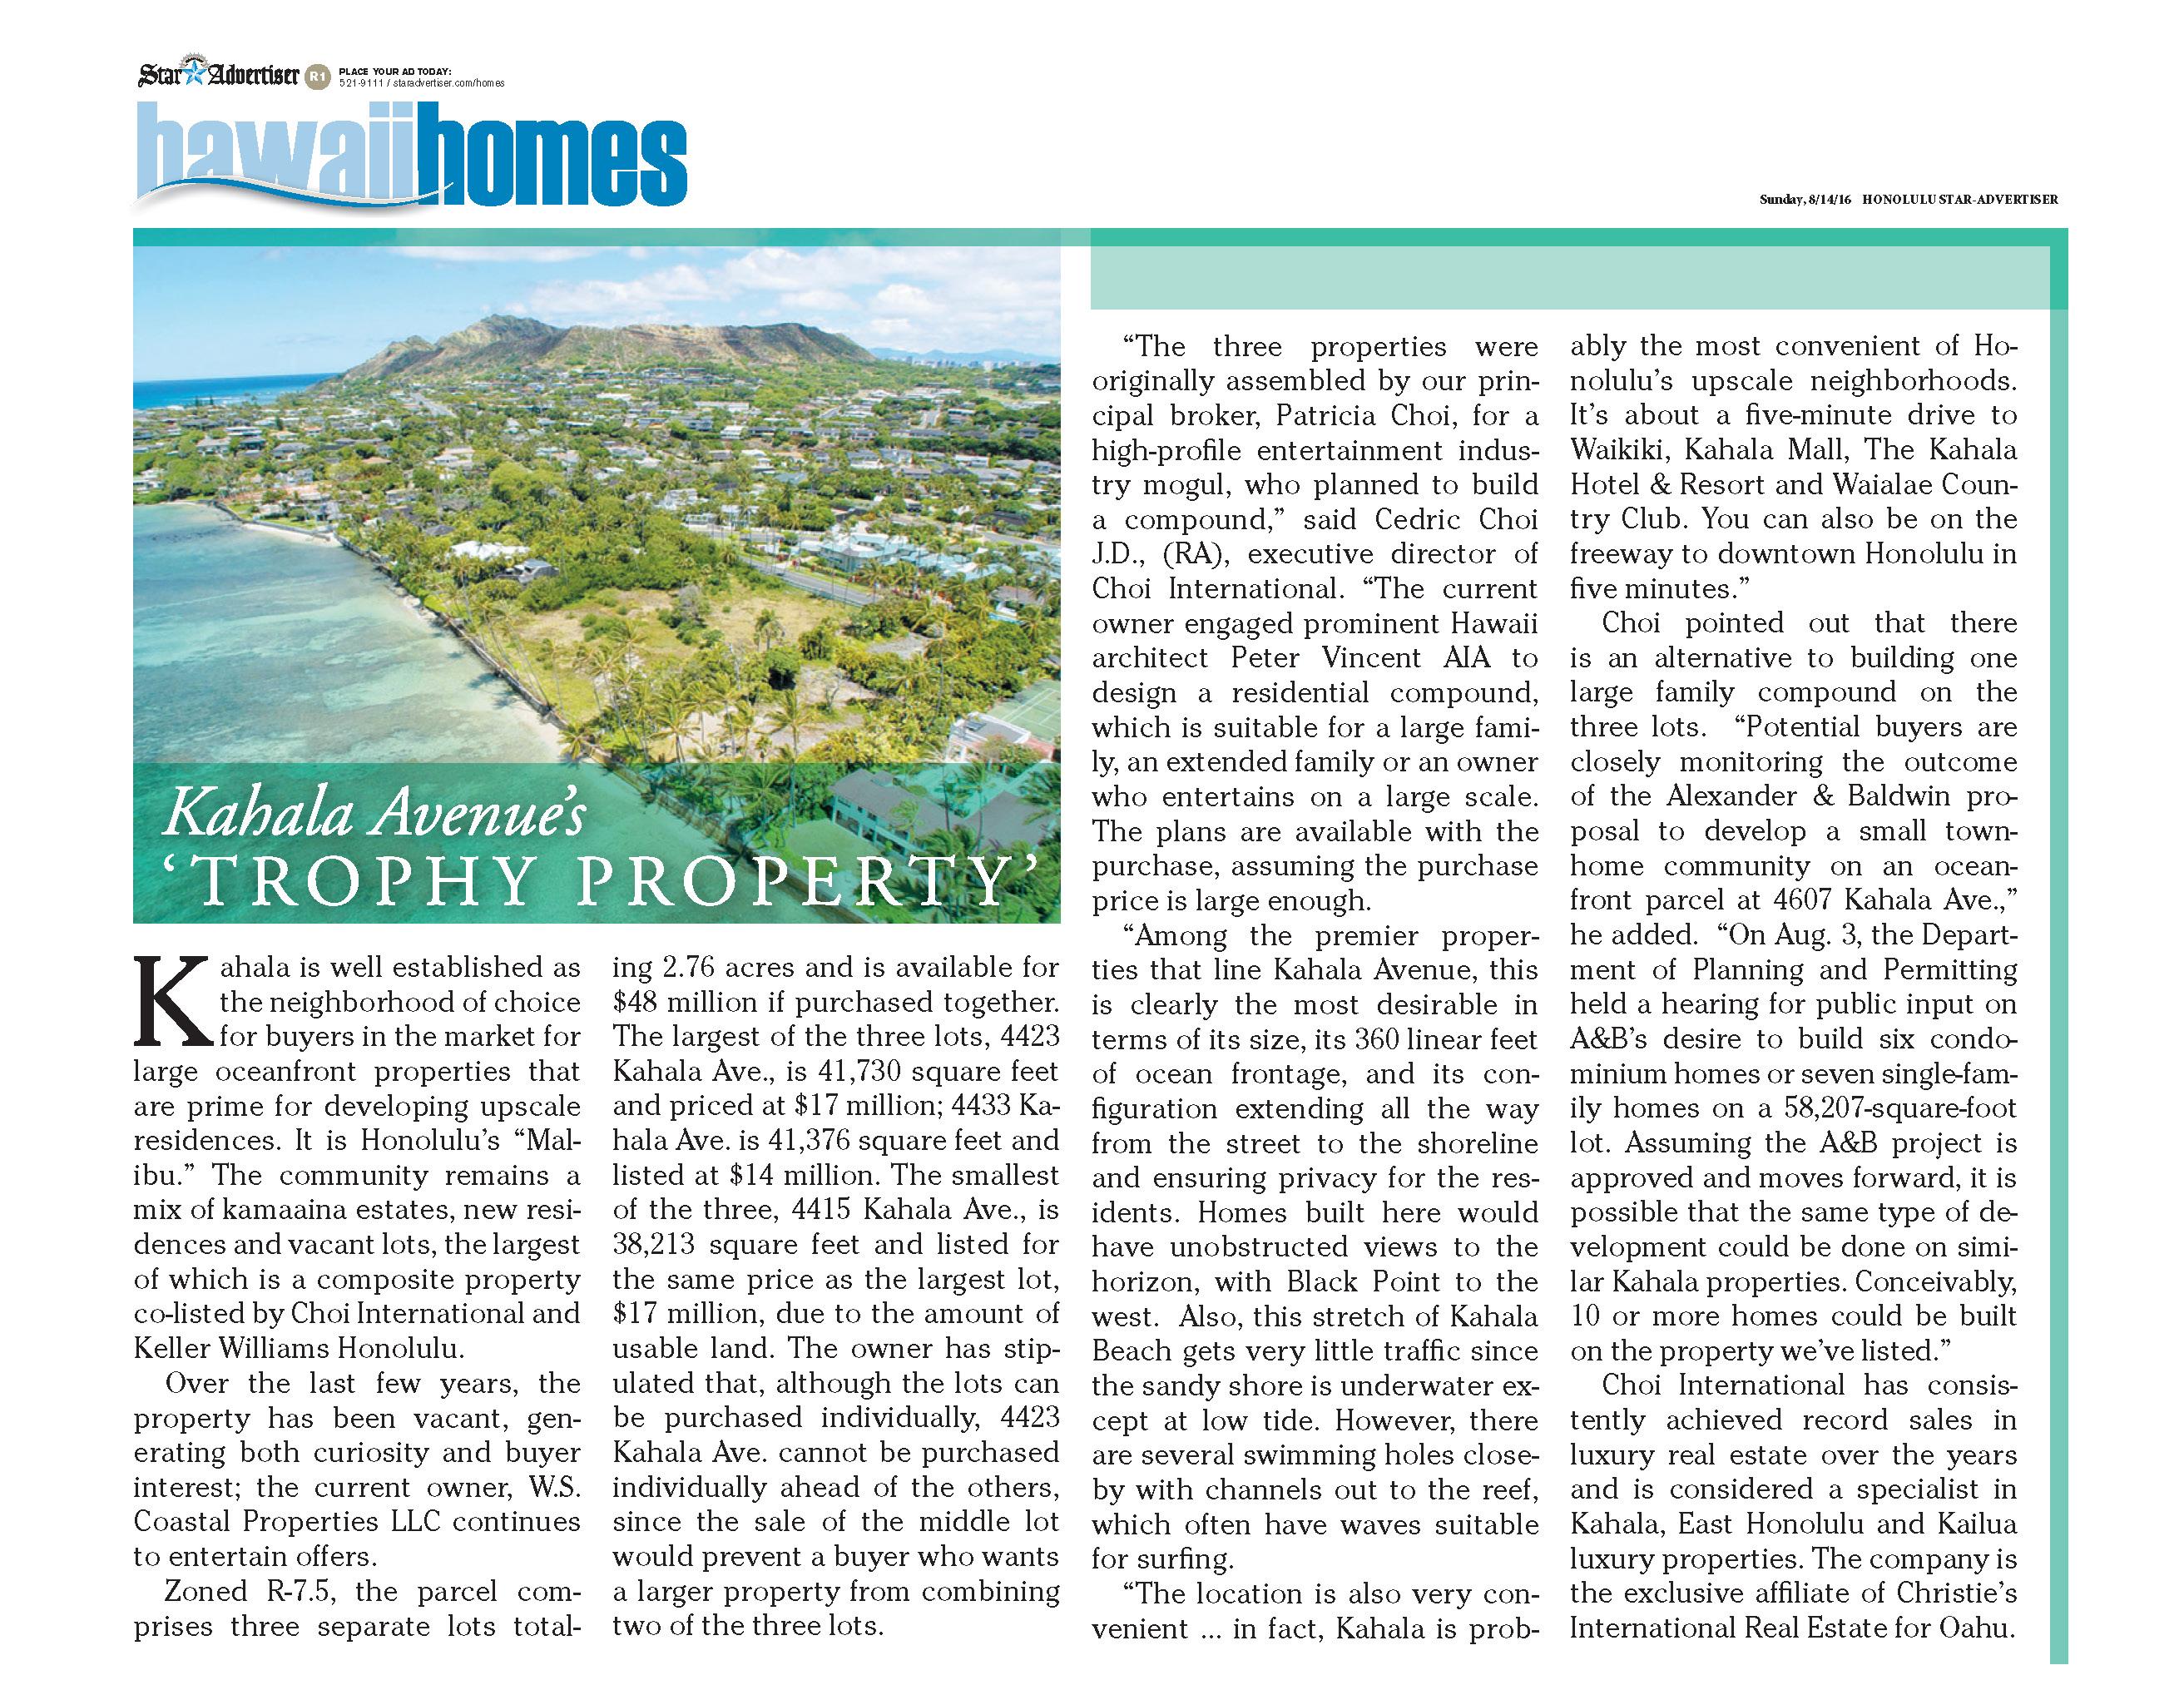 Star-Advertiser 8-14-16_Kahala Avenue's Trophy Property